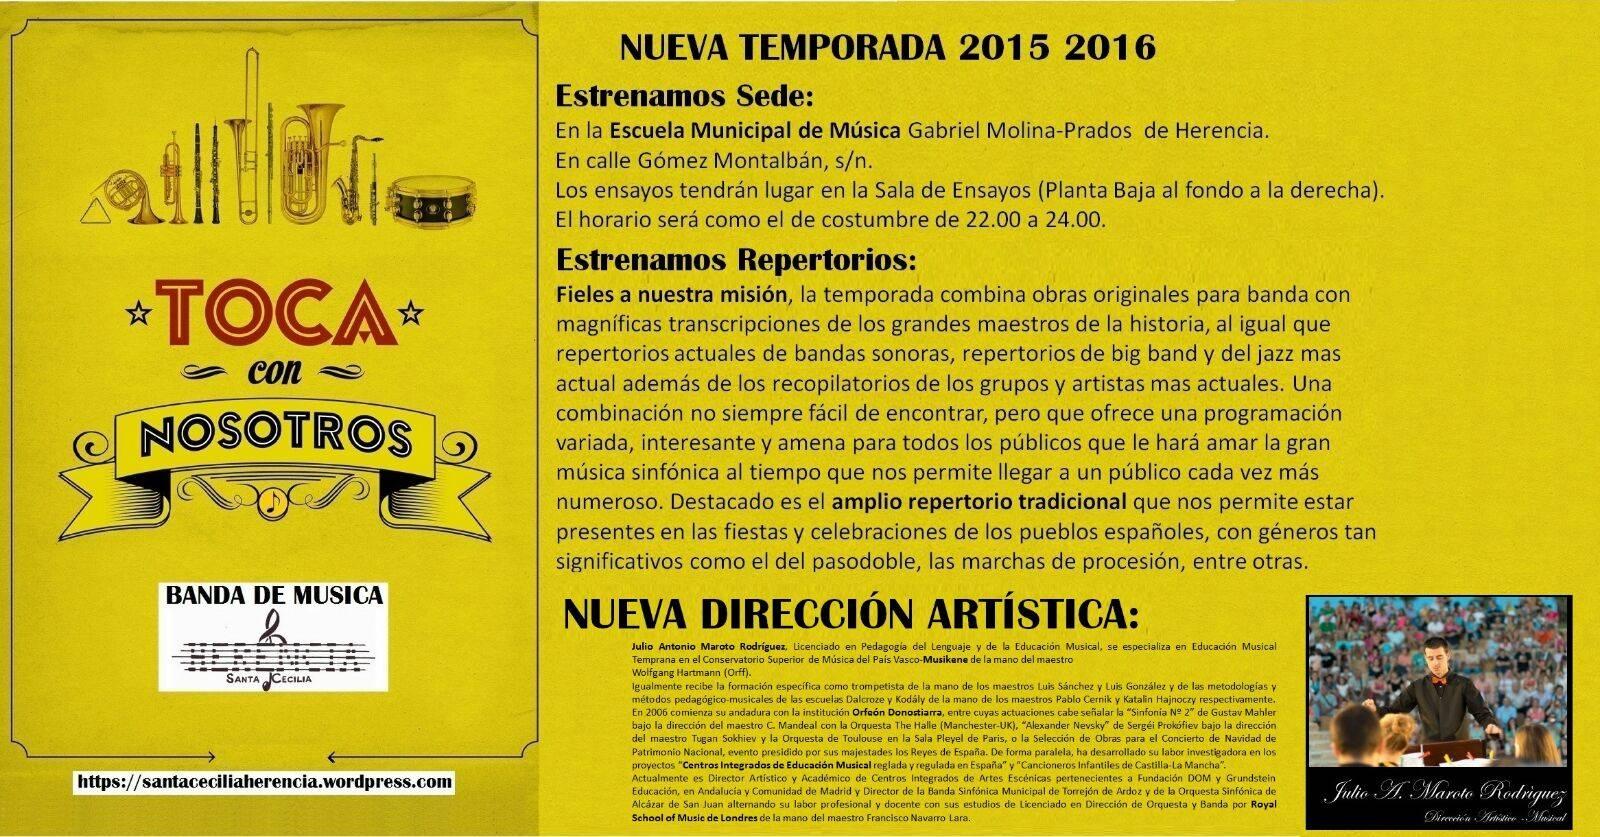 Agrupacion musical Santa Cecilia de Herencia